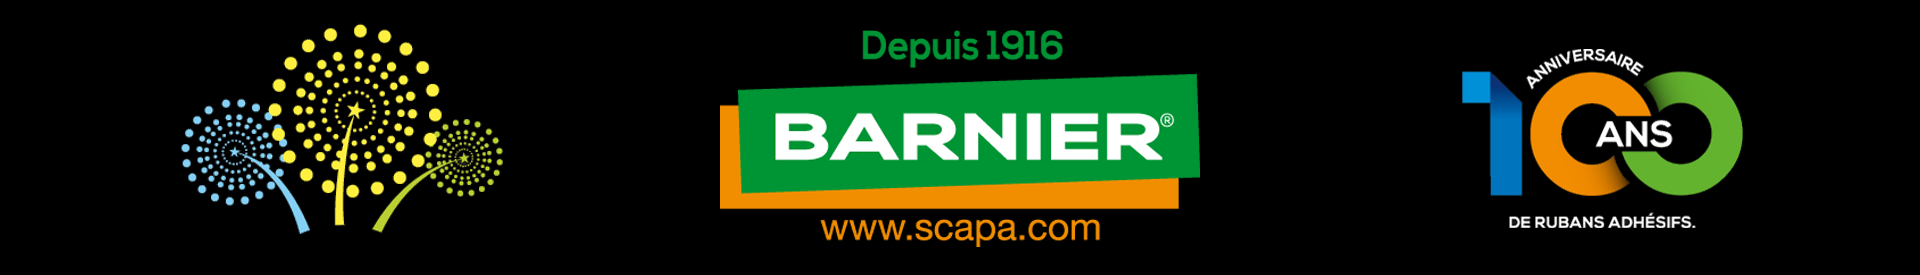 Barnier Brand